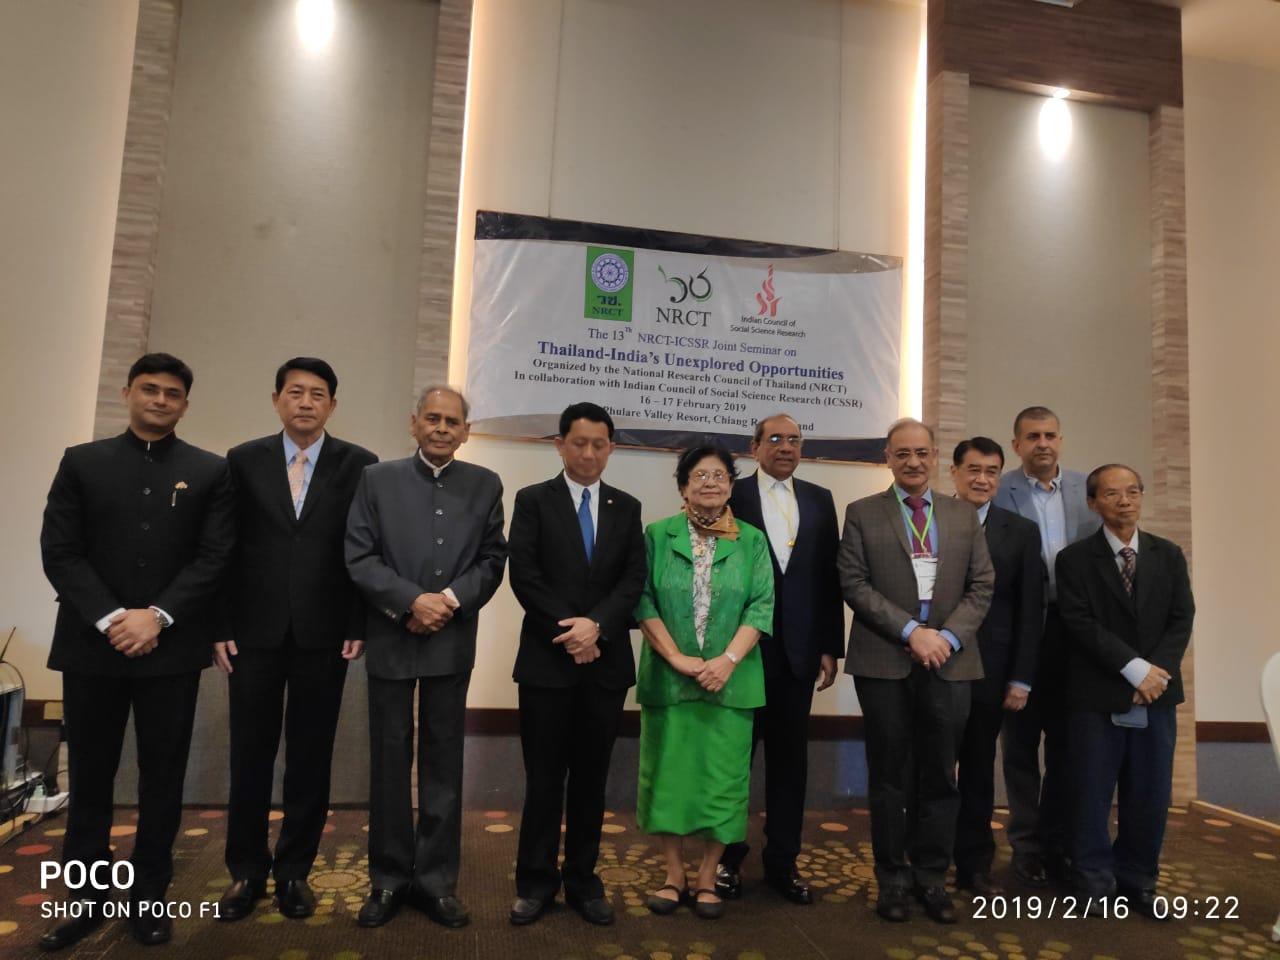 13th NRCT-ICSSR Joint Seminar on